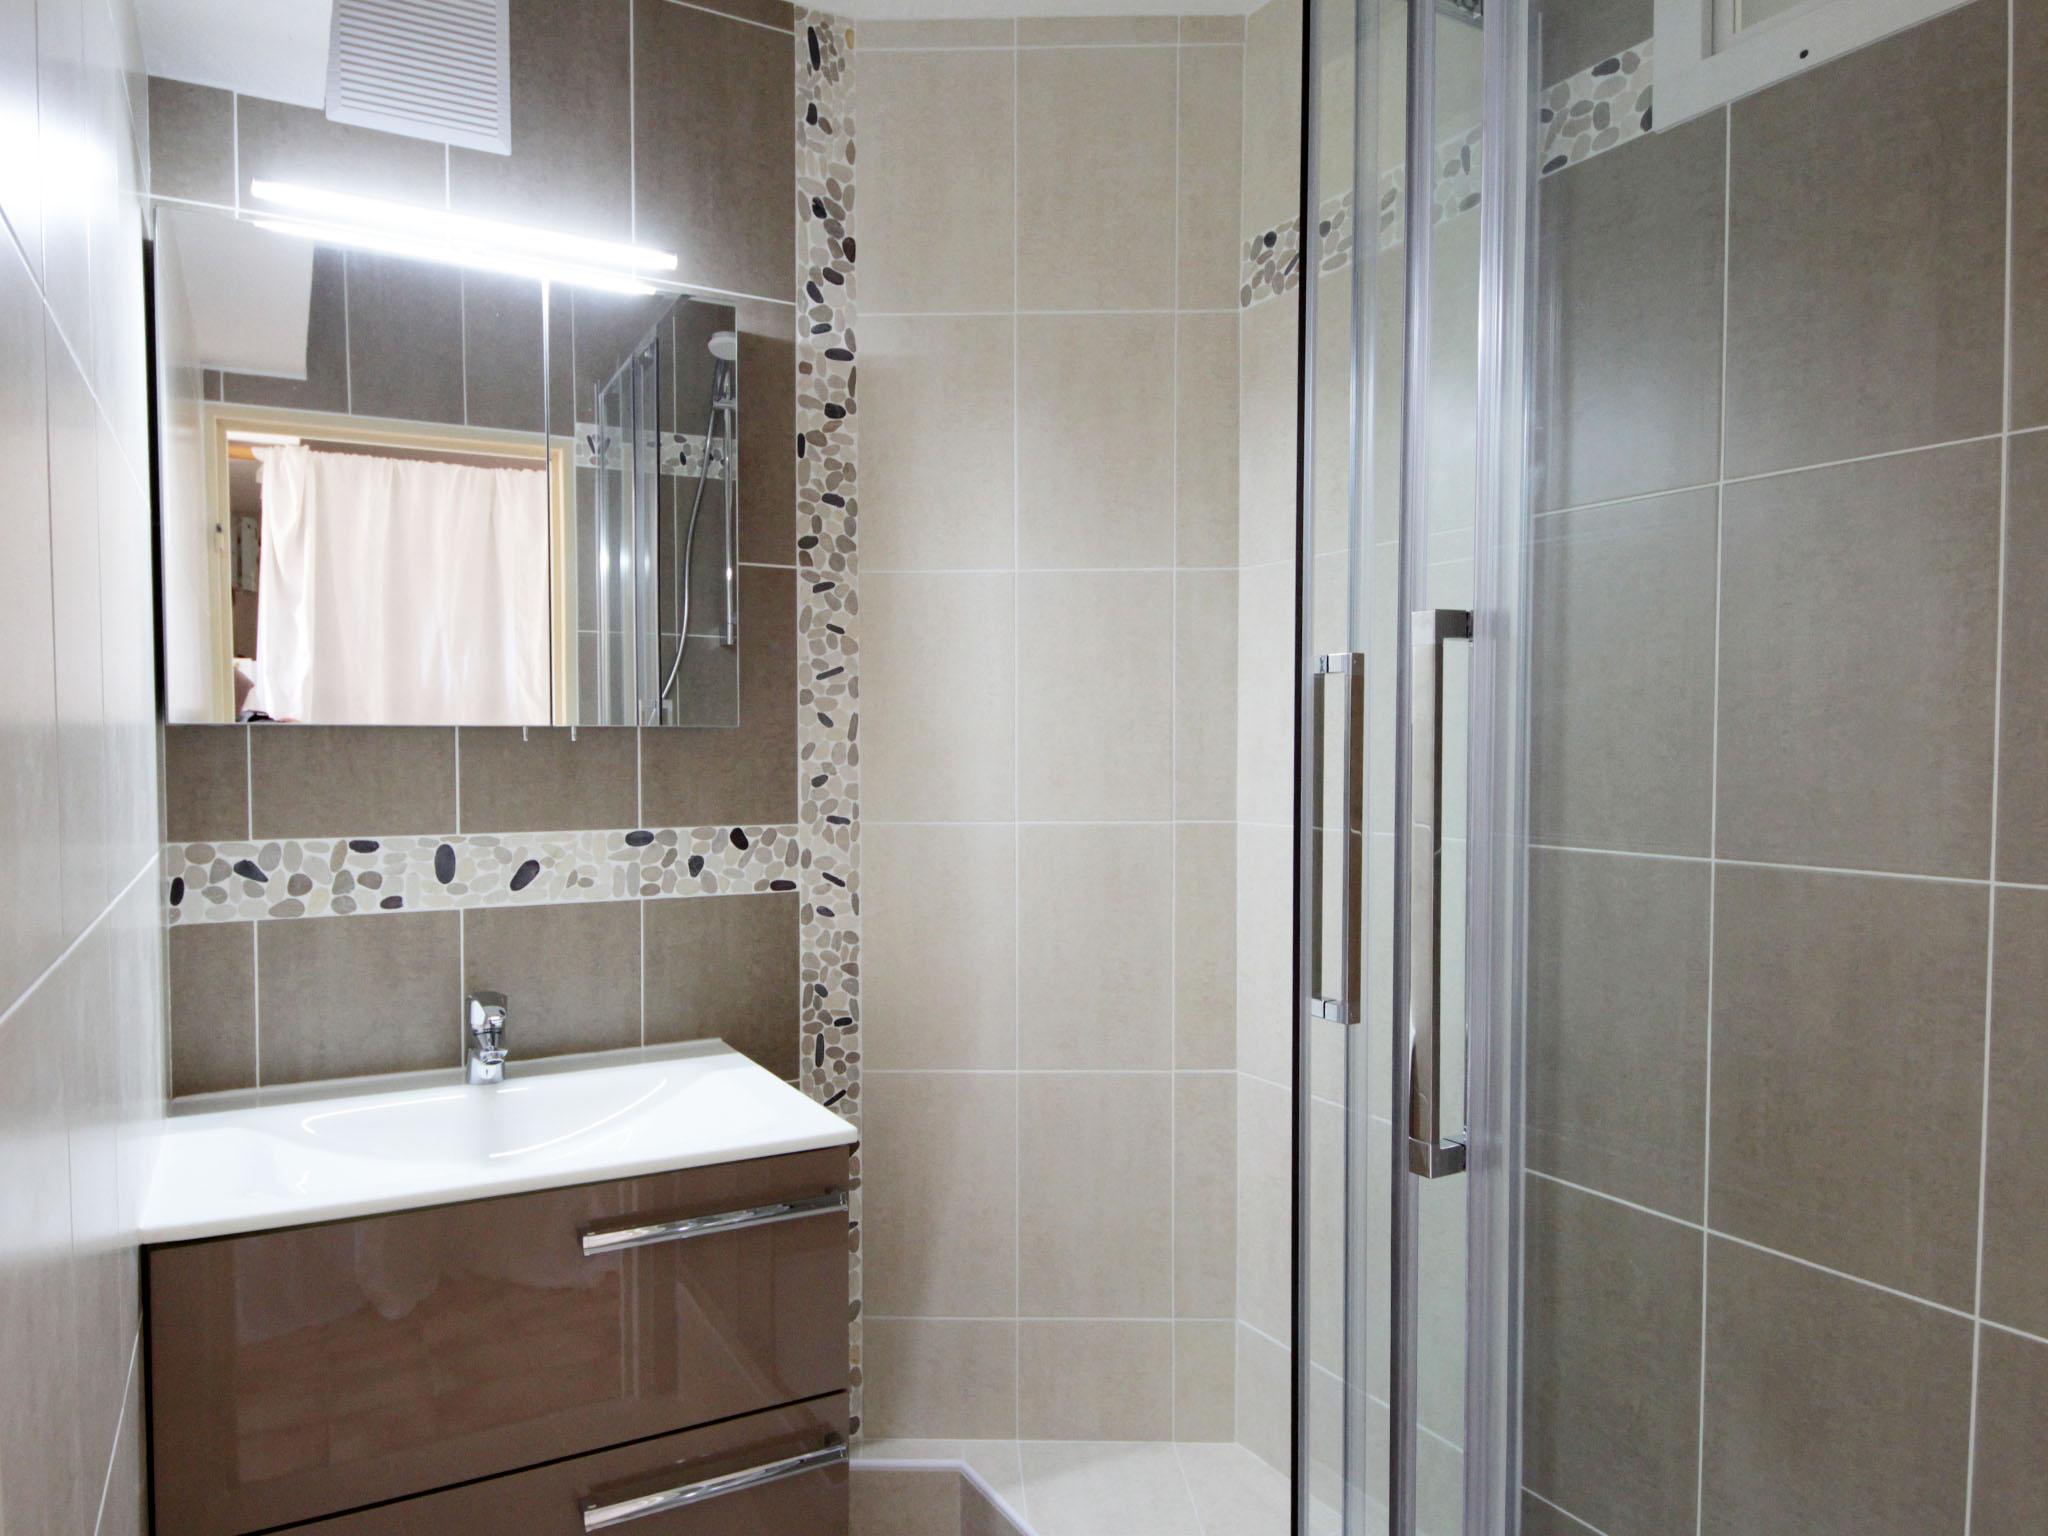 Renovation salle de bain peinture carrelage salle de - Carrelage chocolat salle de bain ...